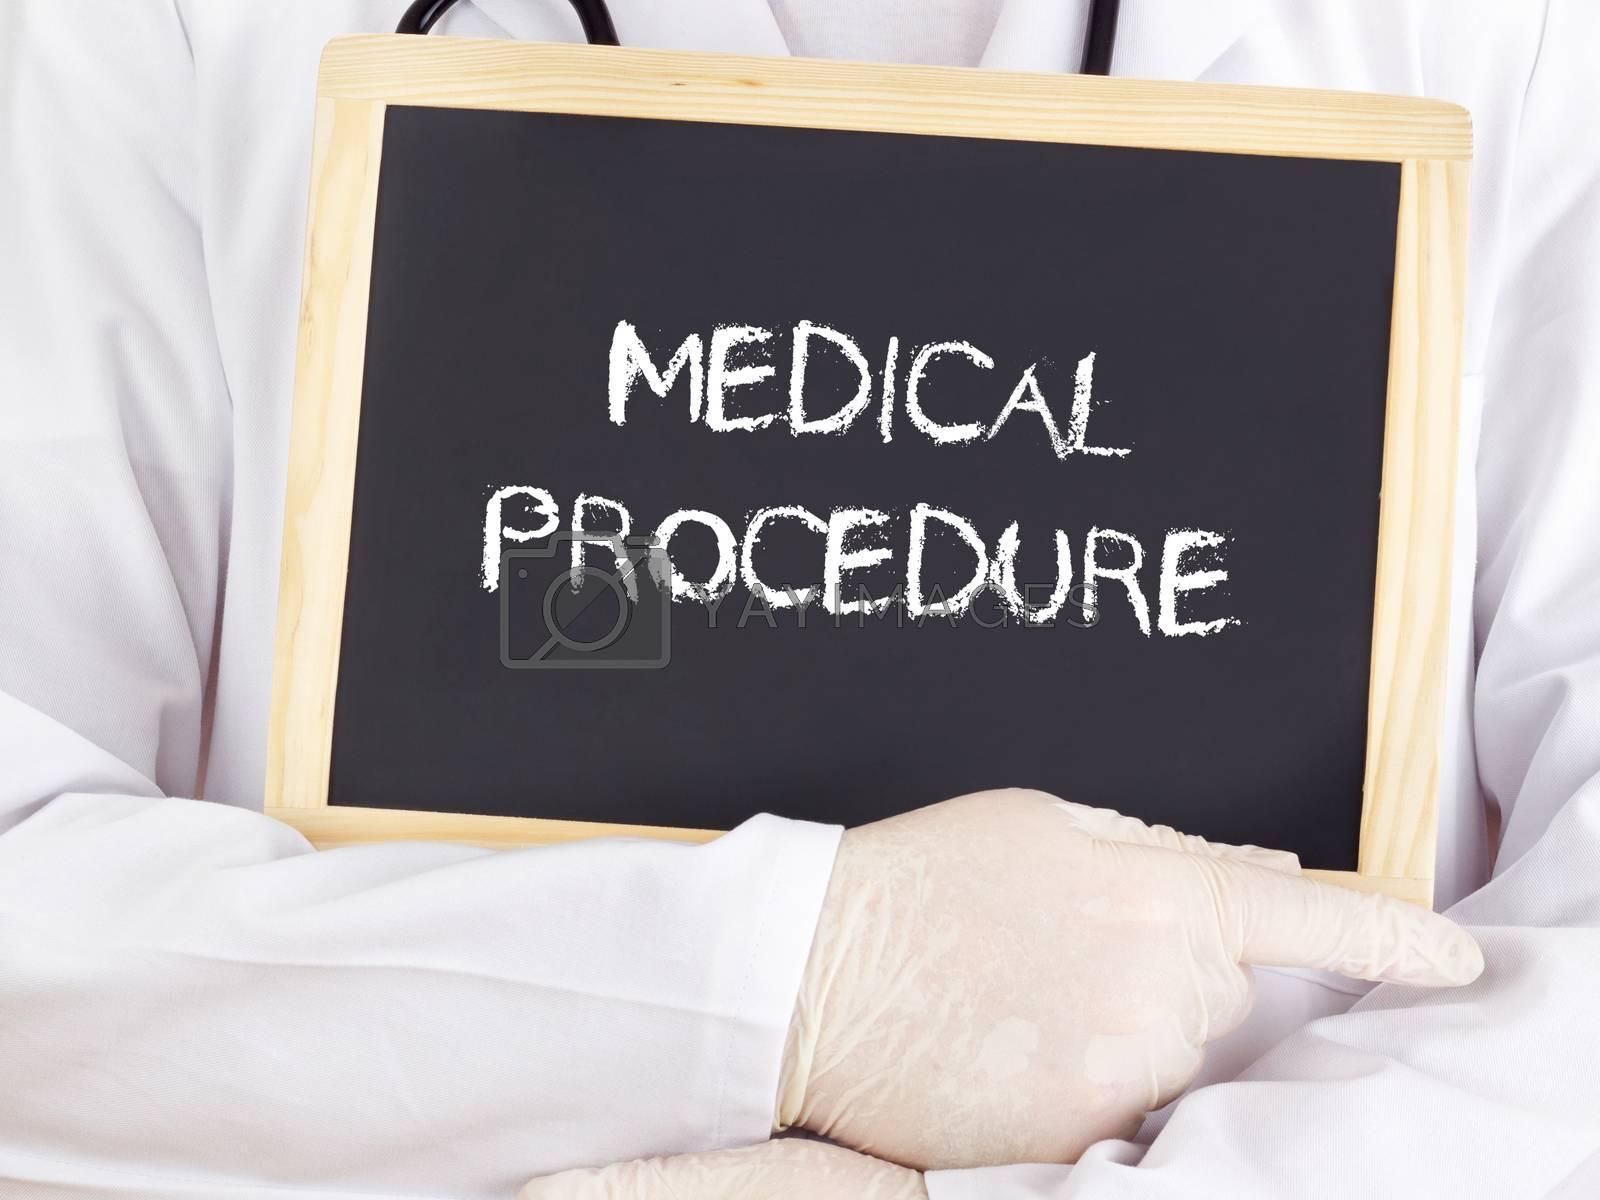 Doctor shows information: medical procedure